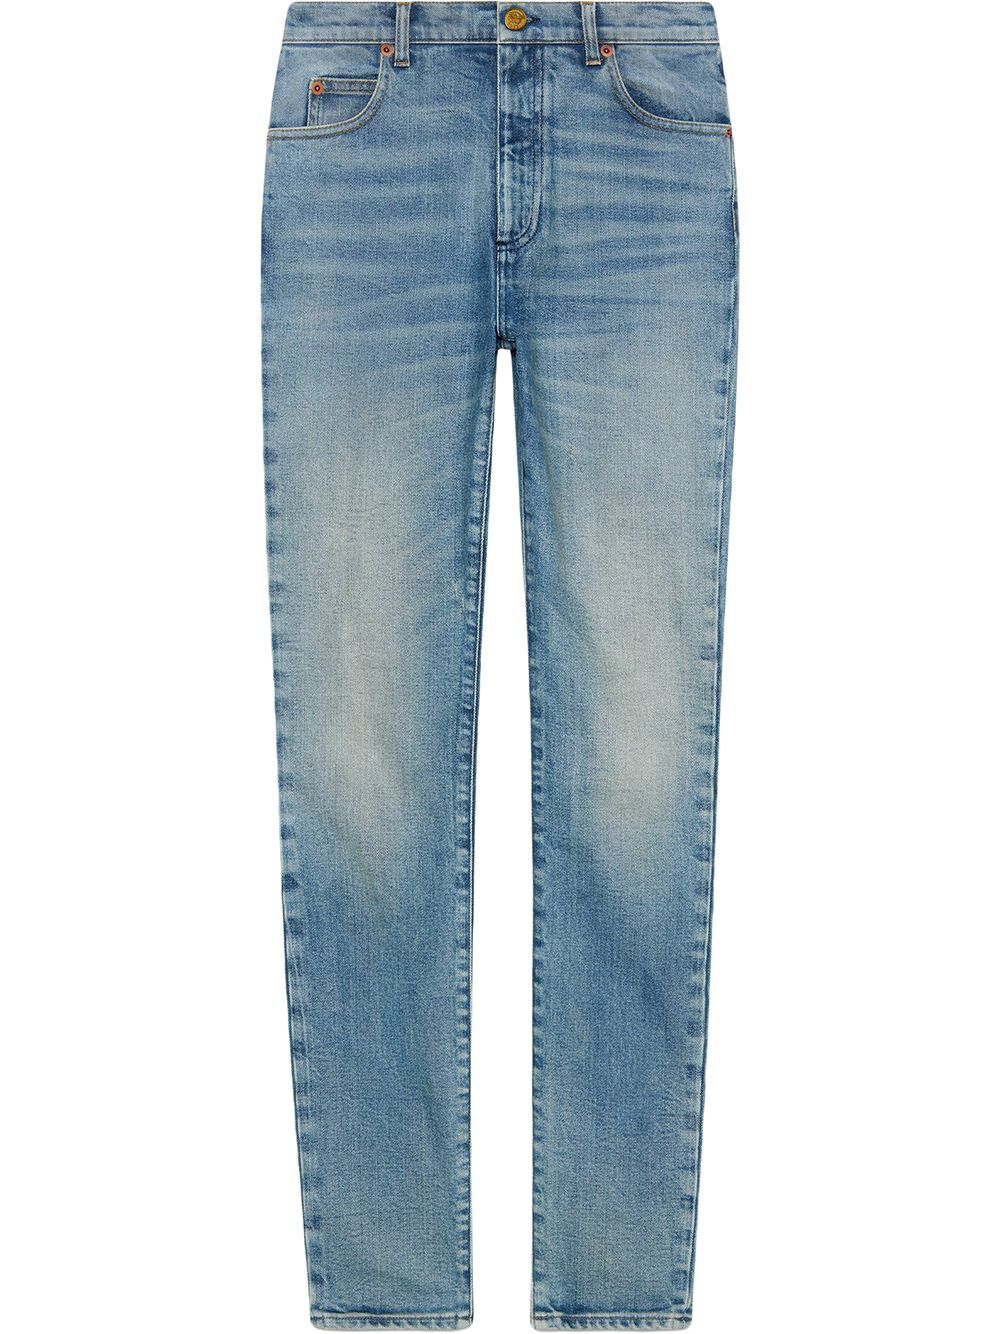 Gucci Klassische Skinny-Jeans - Blau